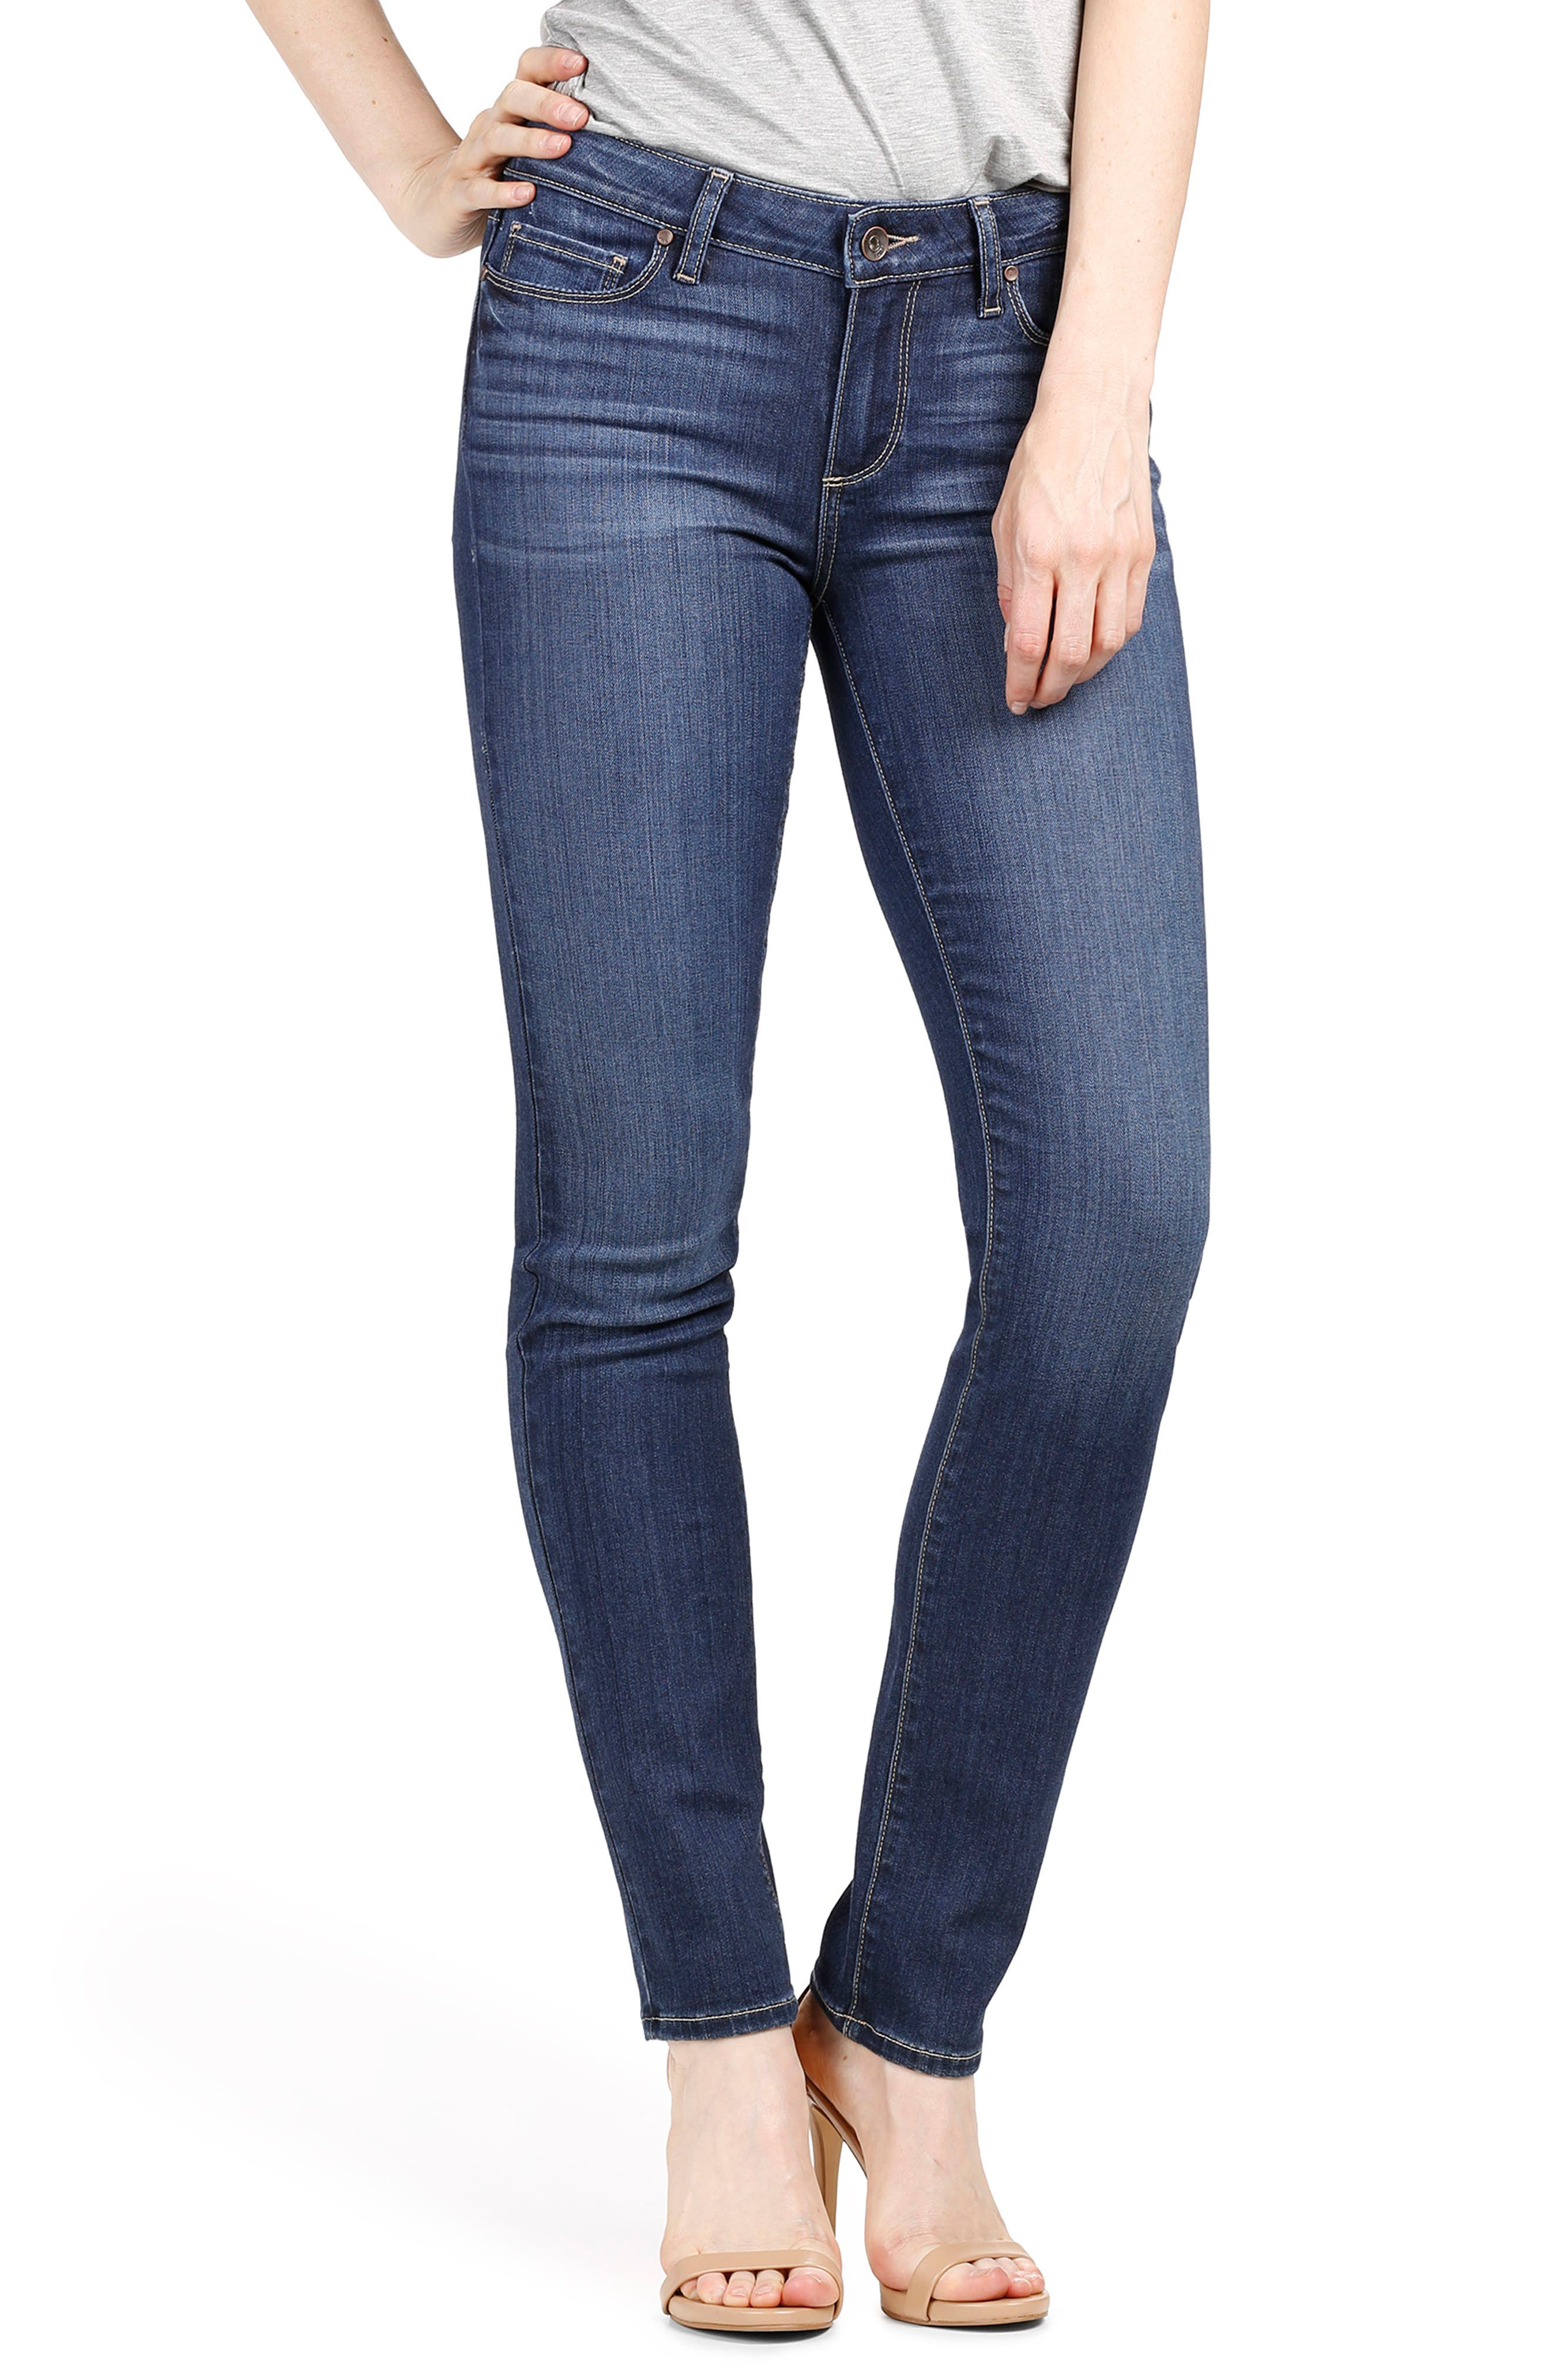 Transcend - Skyline Skinny Jeans,                             Main thumbnail 1, color,                             400